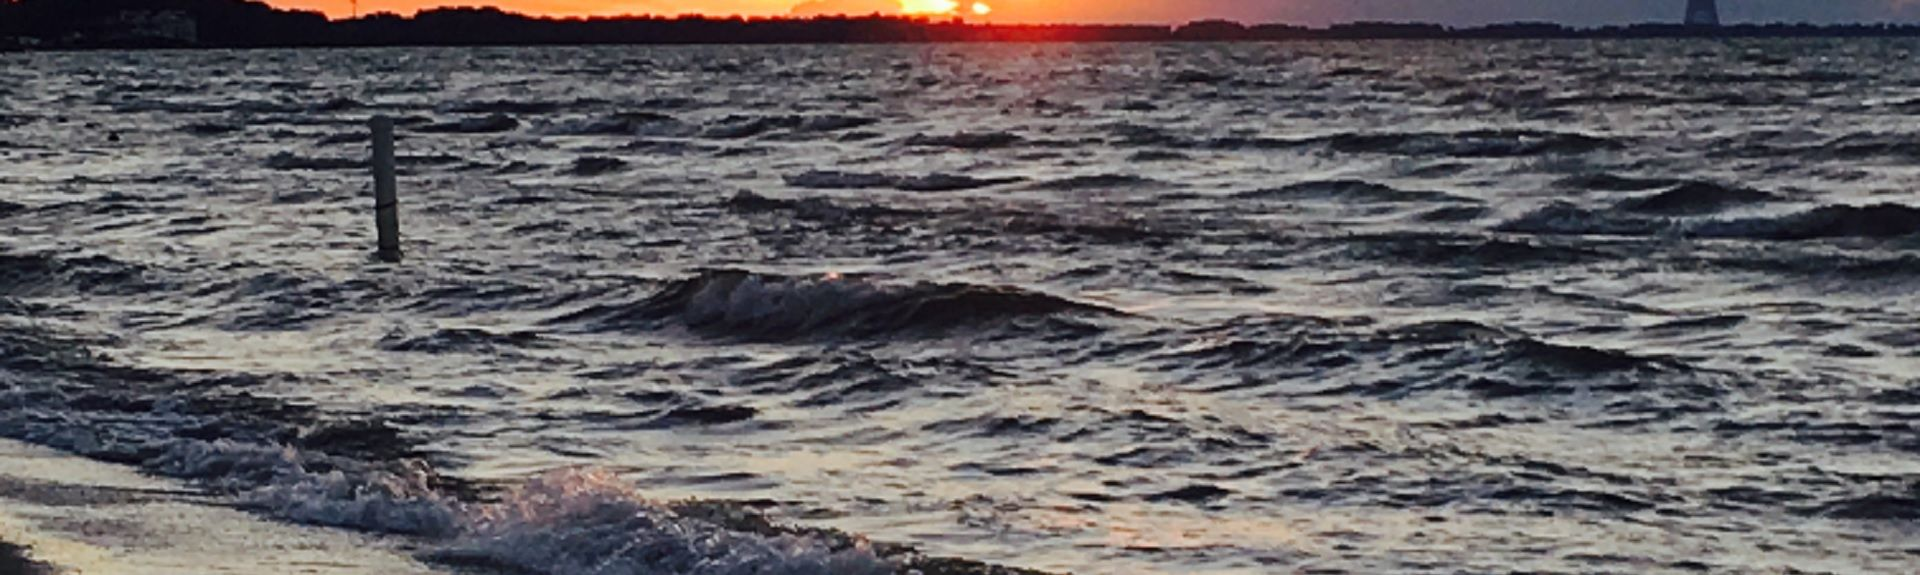 South Bass Island, Ohio, United States of America